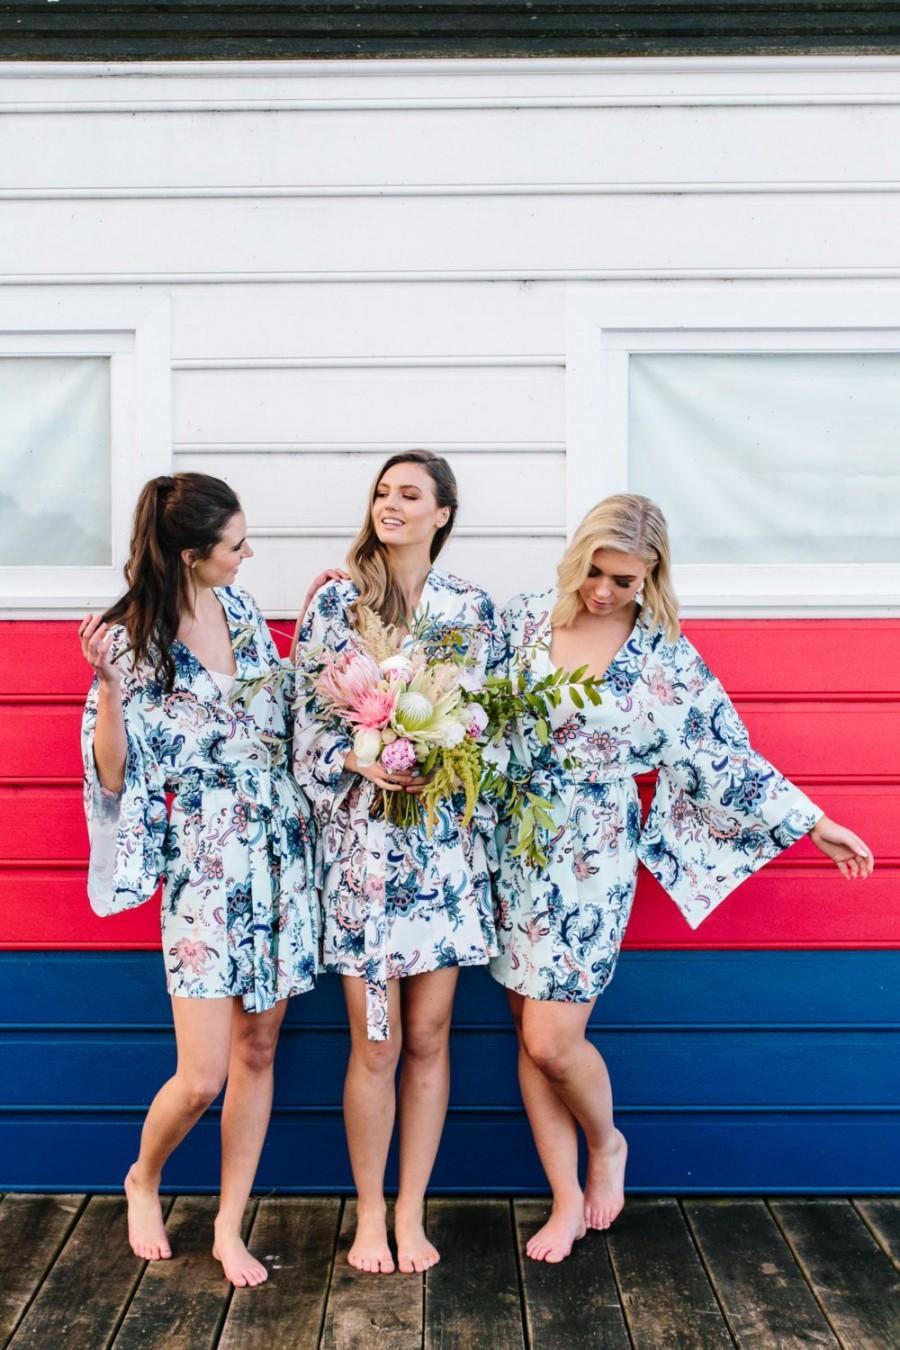 Wedding - Kimono Robe // Bridesmaid Robes // Bridal Robe // Bride Robe // Bridal Party Robes // Bridesmaid Gift // Robe // Floral Robes